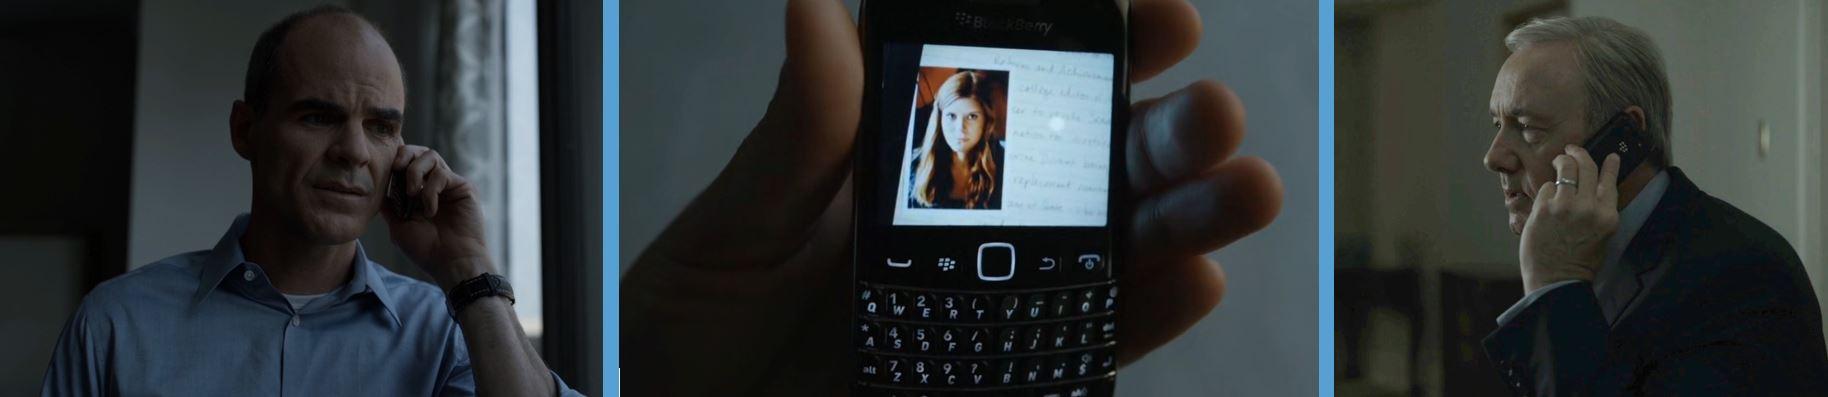 blackberry handsets phone mobile phones in house of cards season 4